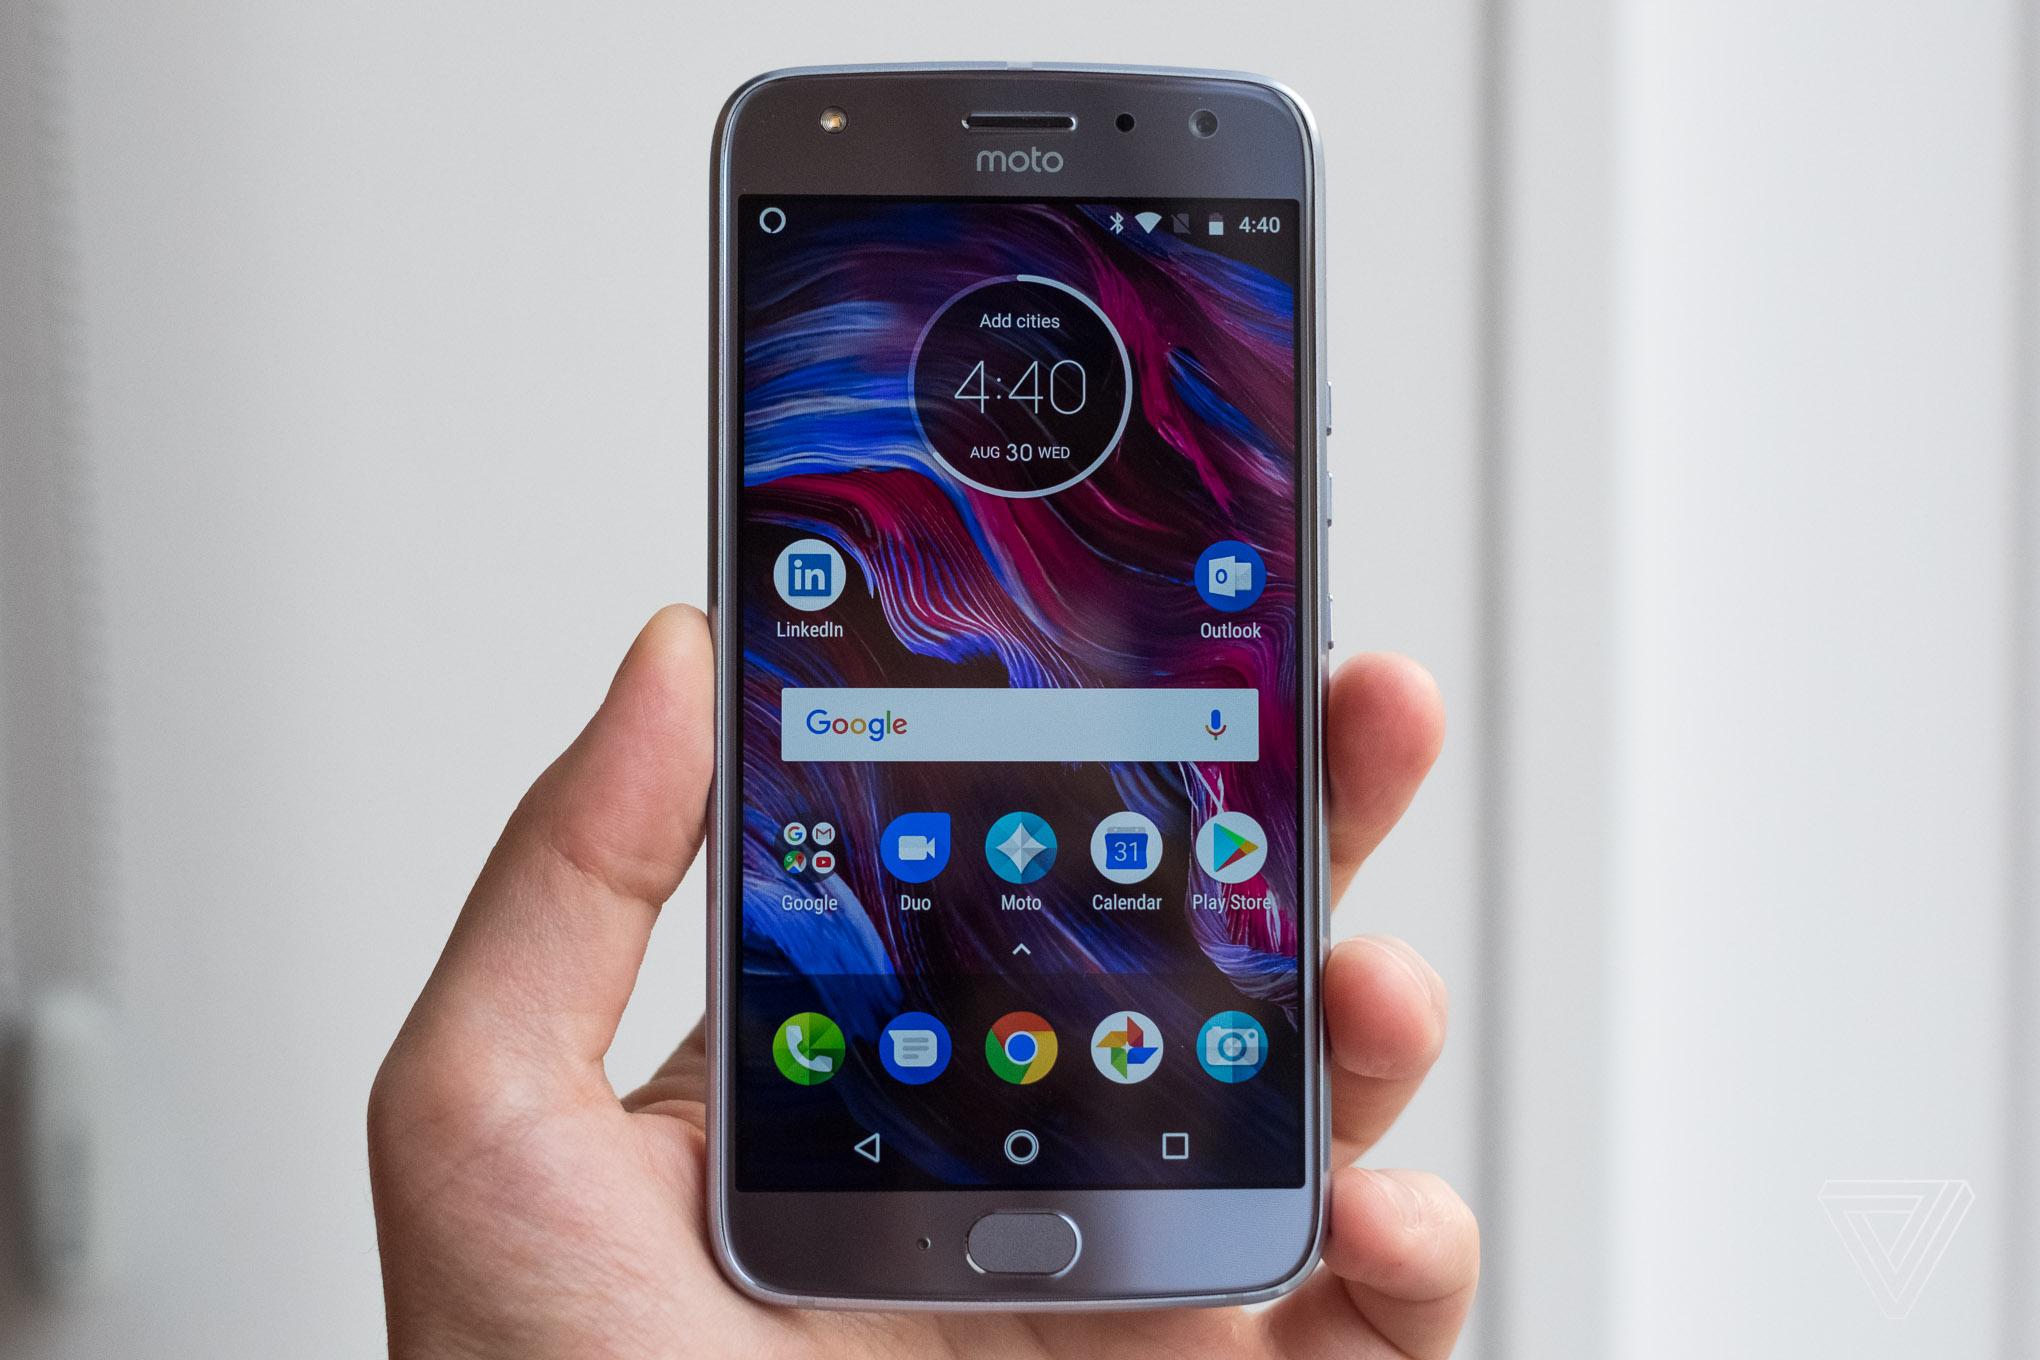 Good Color Motorola S Moto X4 Has Two Cameras And Amazon S Alexa